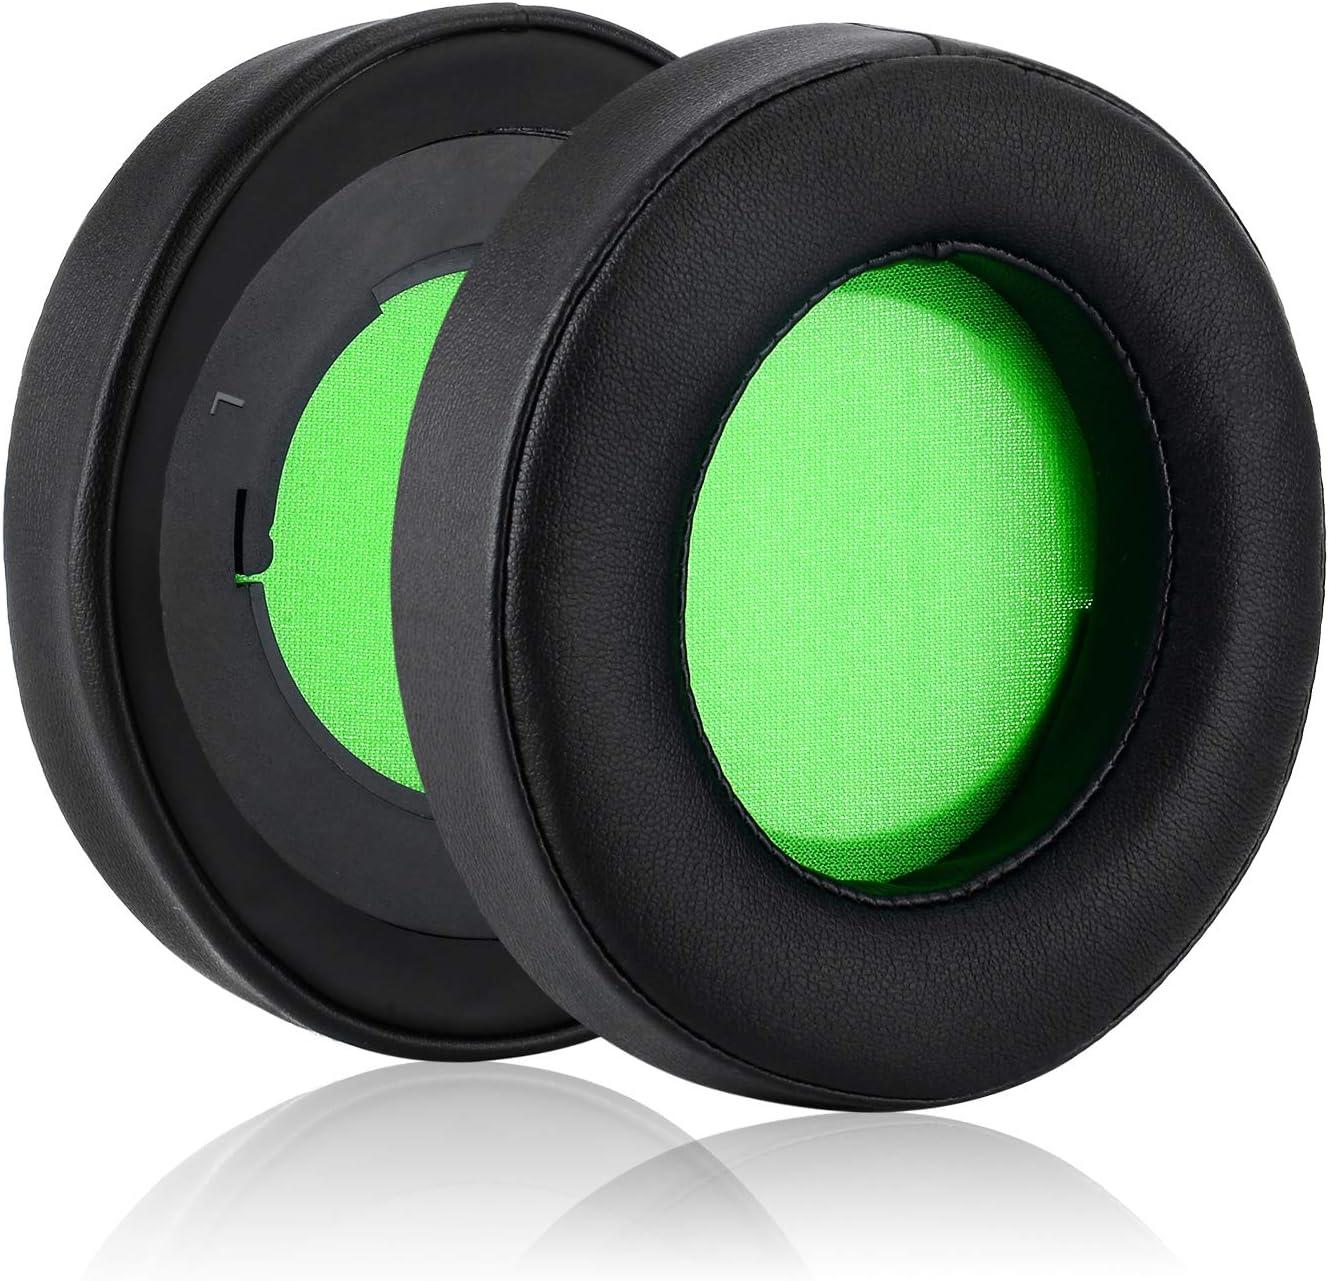 JECOBB Replacement Ear Cushion Cover with Protein Leather /& Memory Foam for Razer Kraken V2 PRO Headphone ONLY Black/&Green Kraken V2 PRO Earpads Oval